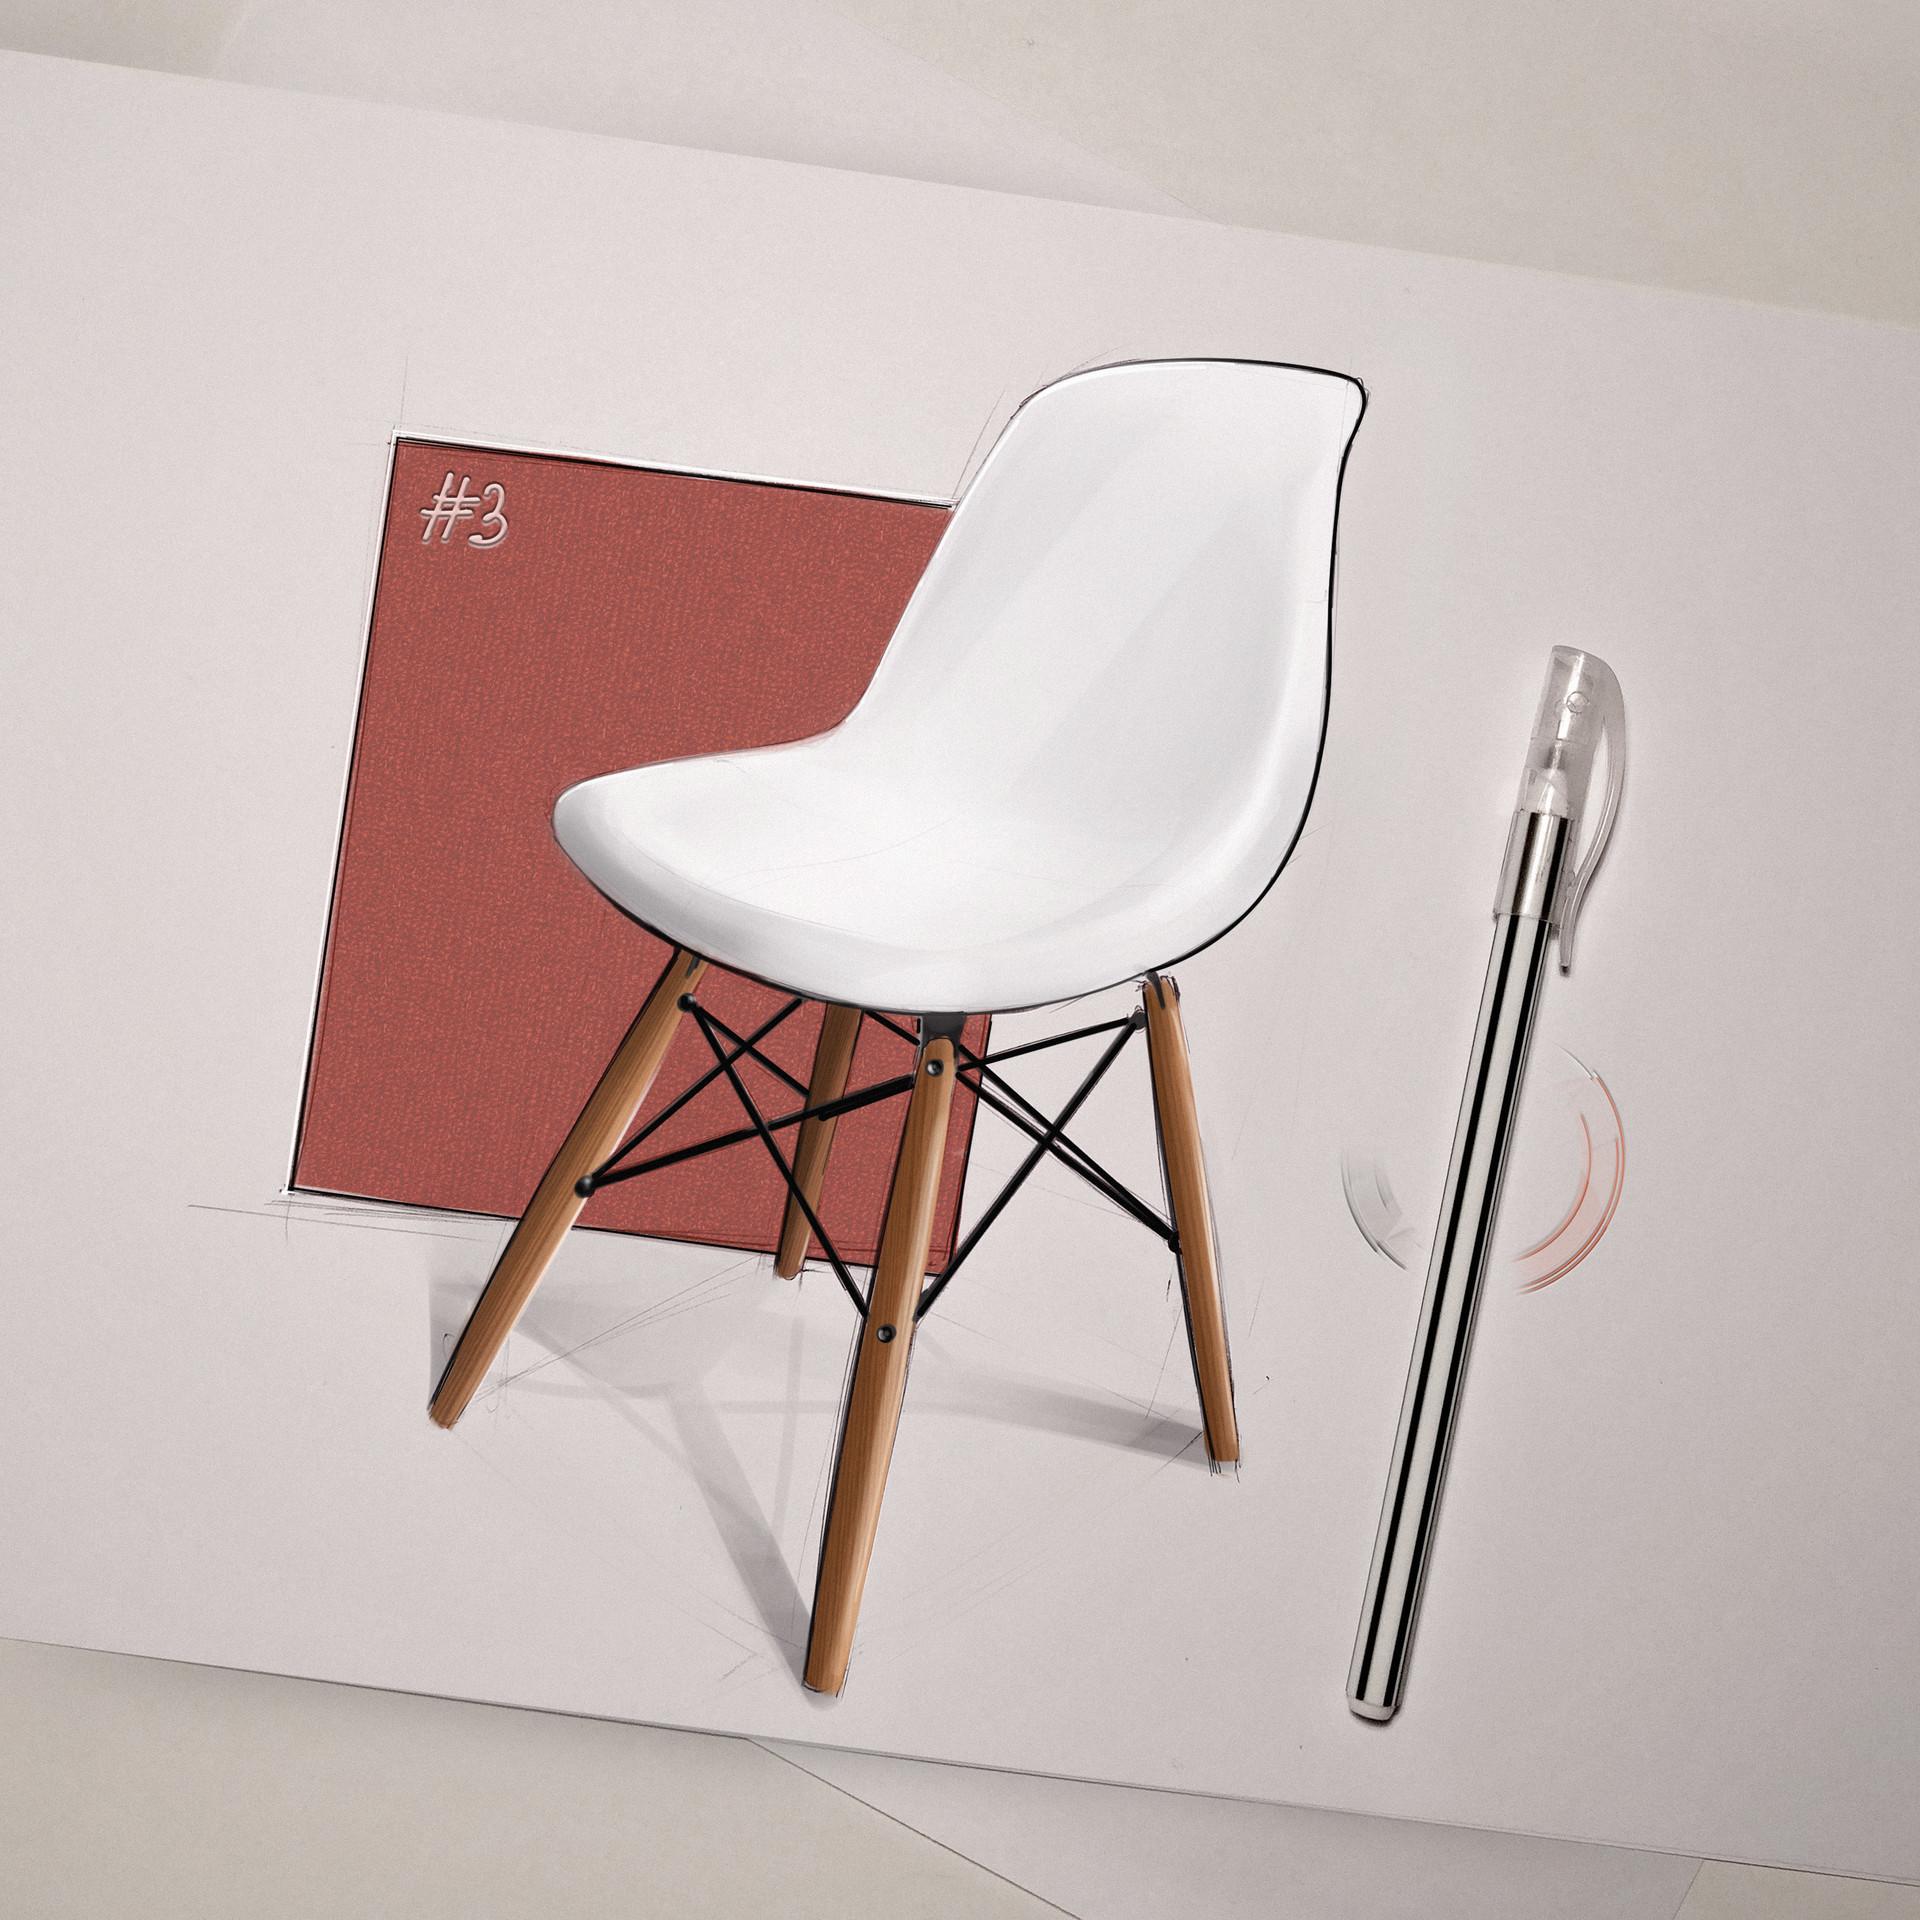 ArtStation - Iconic Product Sketches, Sushant Vohra